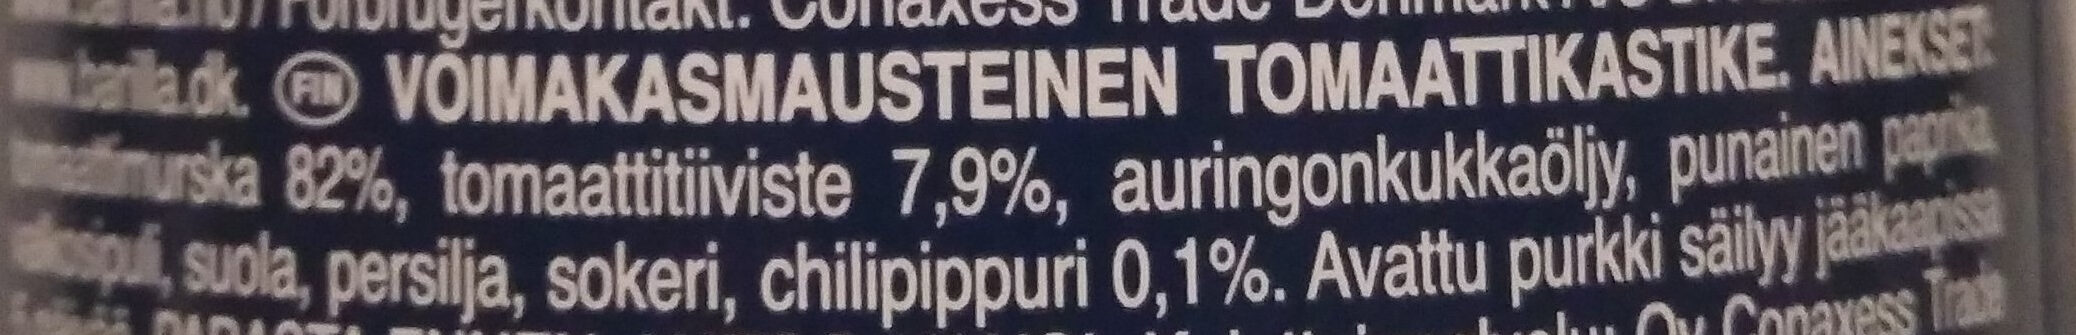 Barilla sauce tomates arrabbiata - Ainesosat - fi